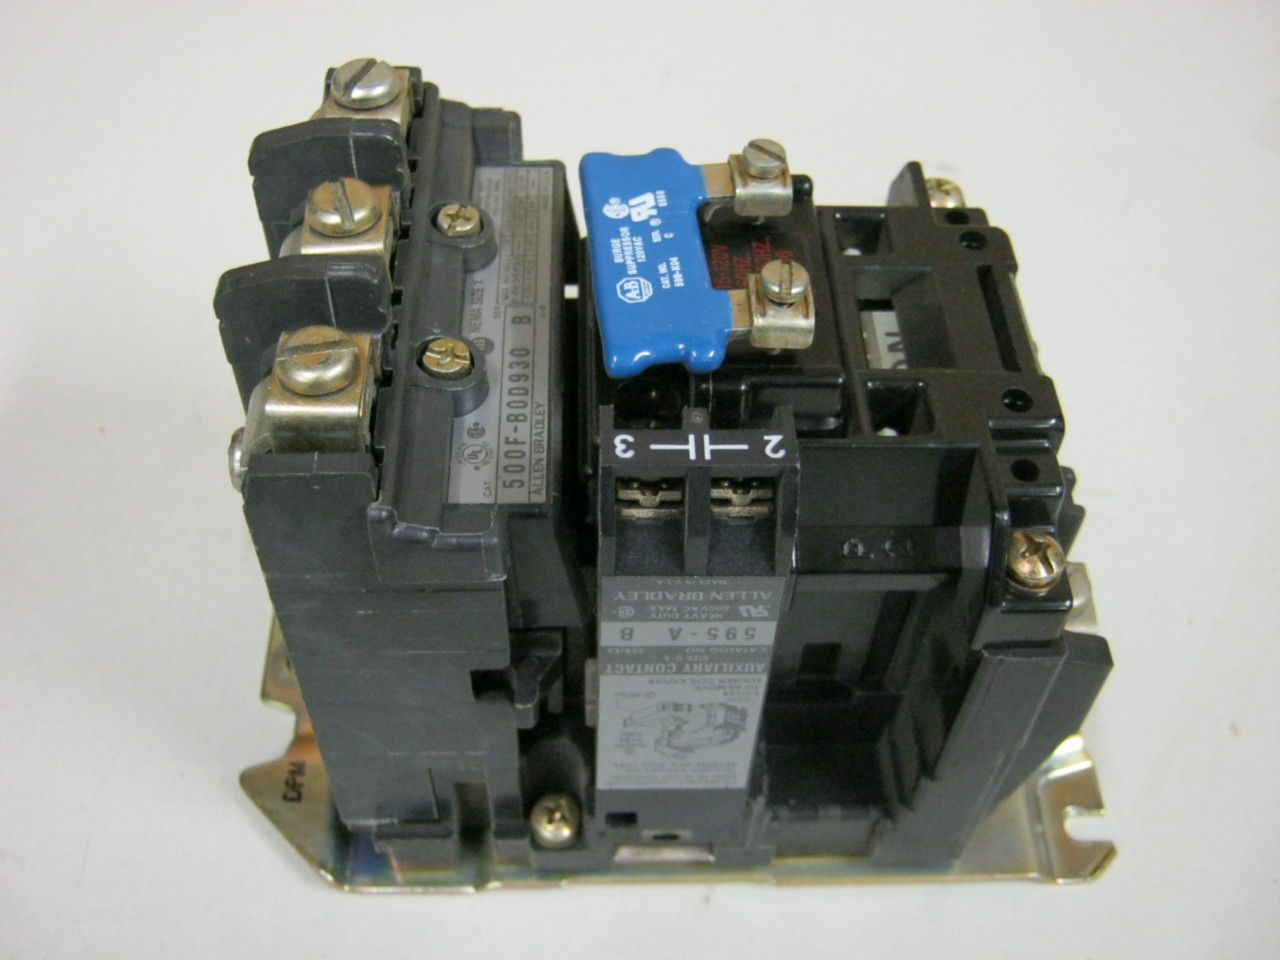 Allen Bradley 500f Bod930 Nema Size 1 Motor Starter 600 Vac 27 Amp120 Volt Coil Ebay